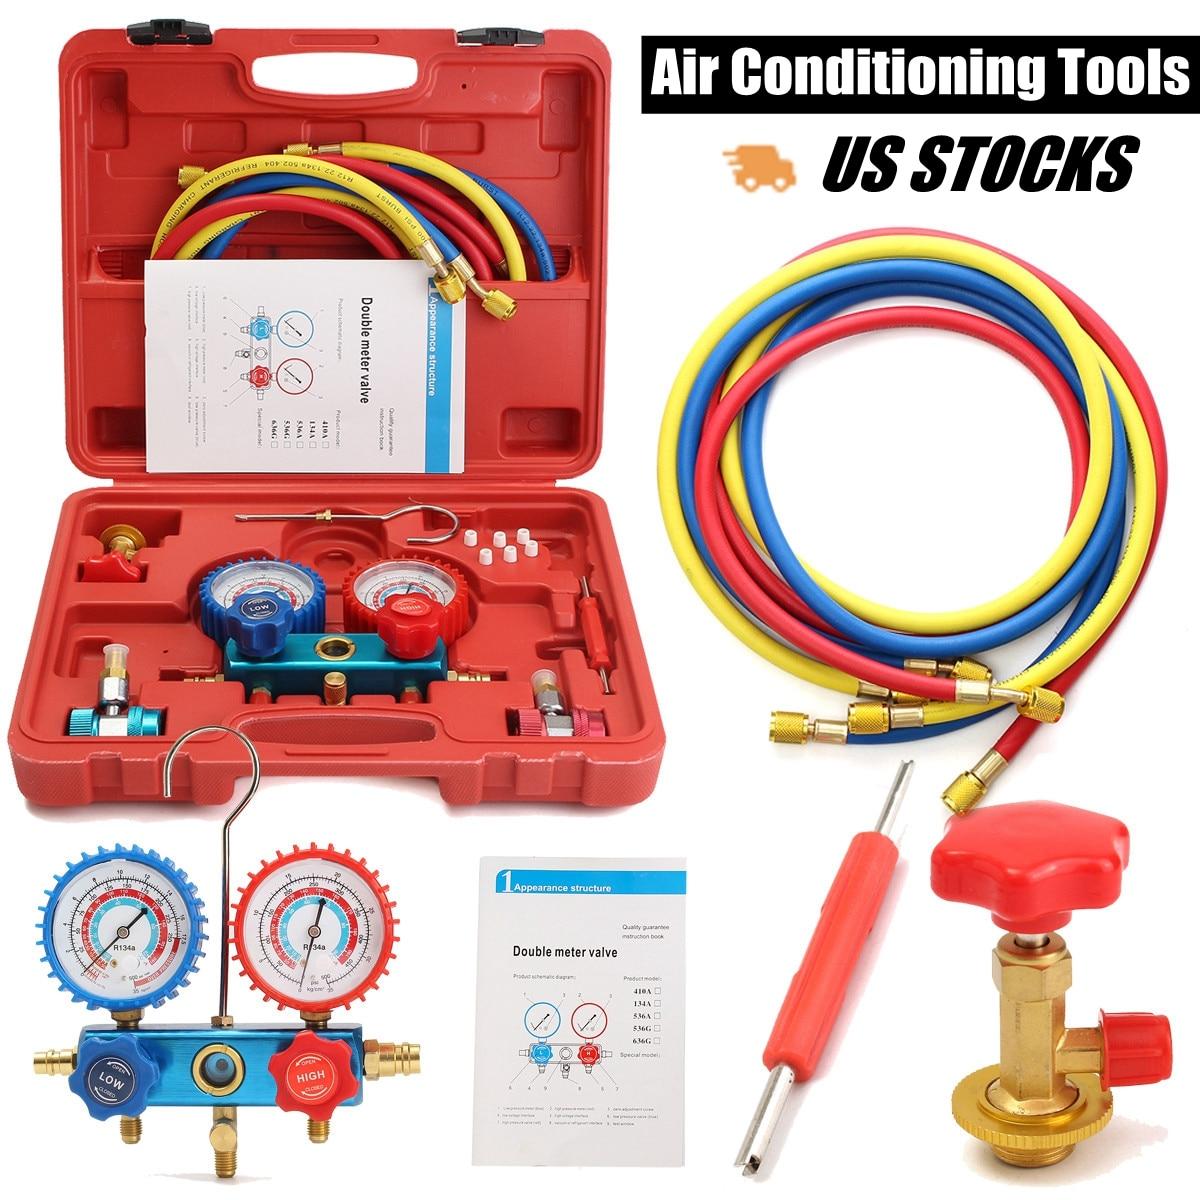 R134A HVAC A/C Refrigeration Kit AC Manifold Gauge Set Auto Service Kit Car Air Conditioning Repair Fluorine Filling Tool цена